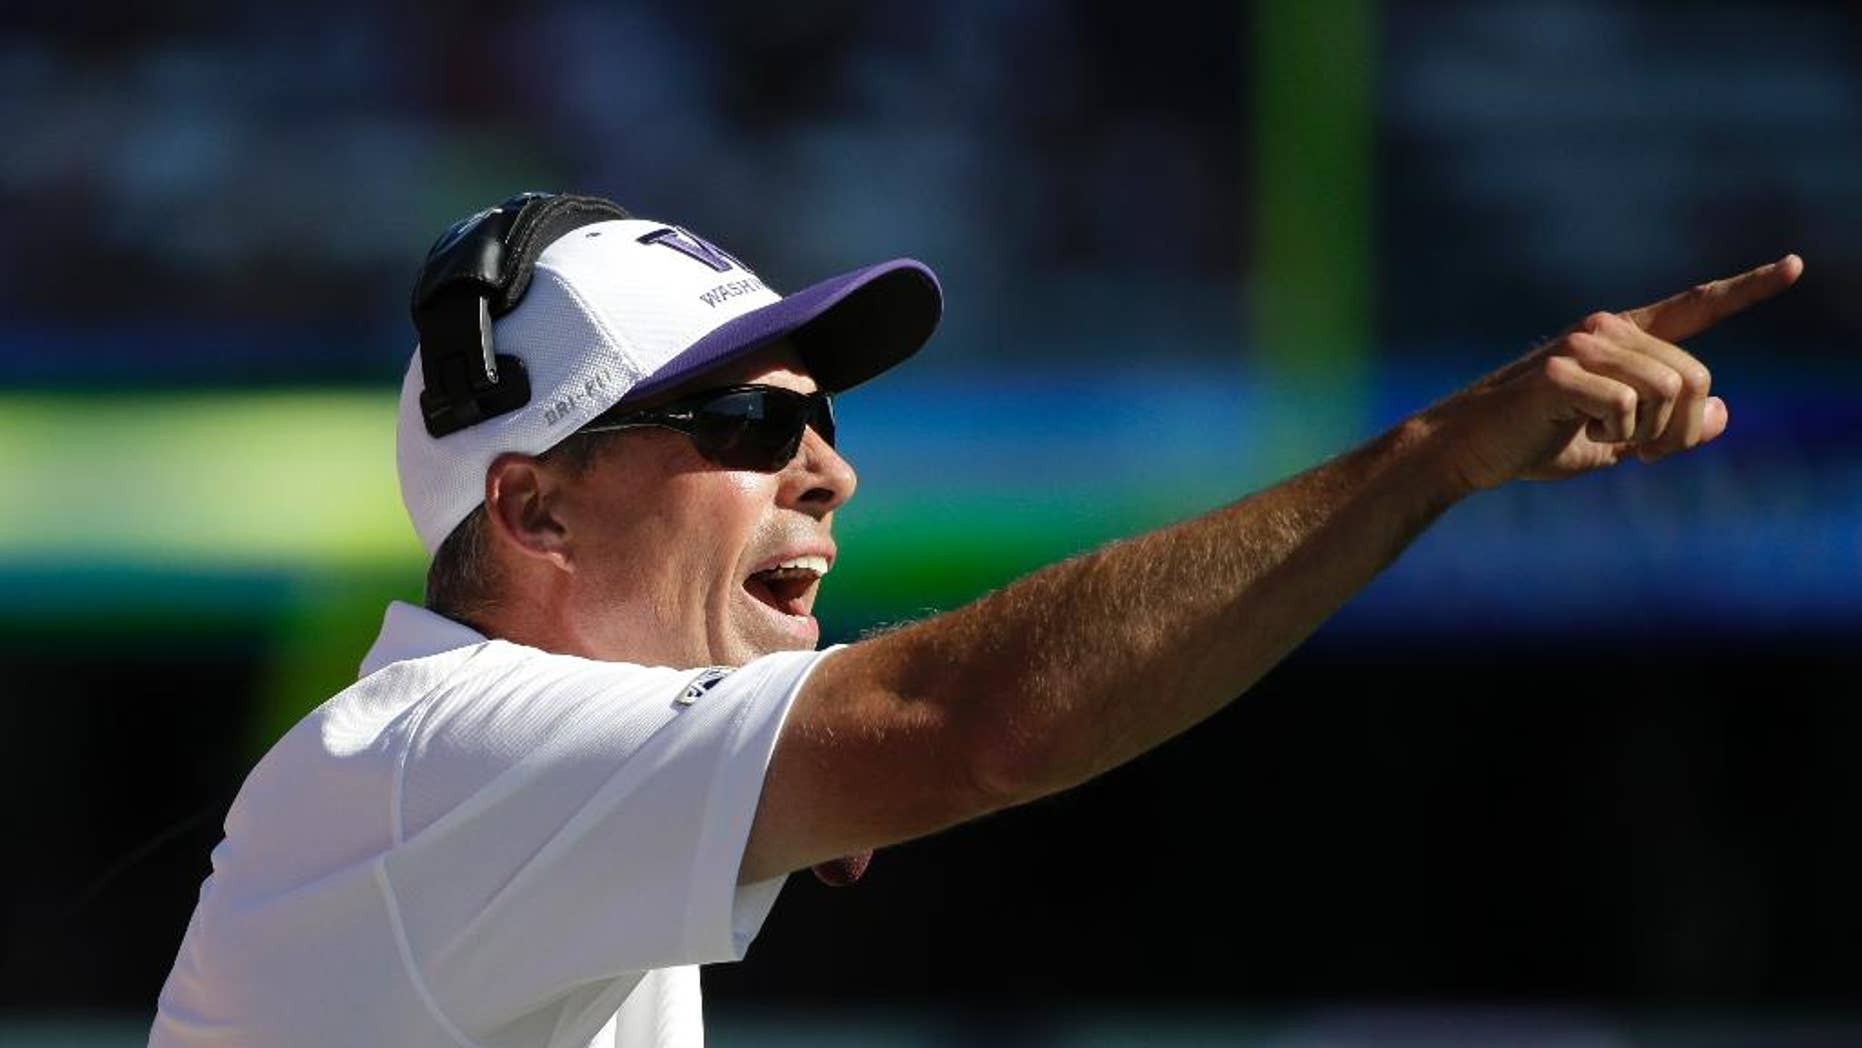 Washington Huskies head coach Chris Petersen yells toward the field in the second half of an NCAA football game Saturday, Sept. 6, 2014, in Seattle. Washington won 59-52. (AP Photo/Elaine Thompson)